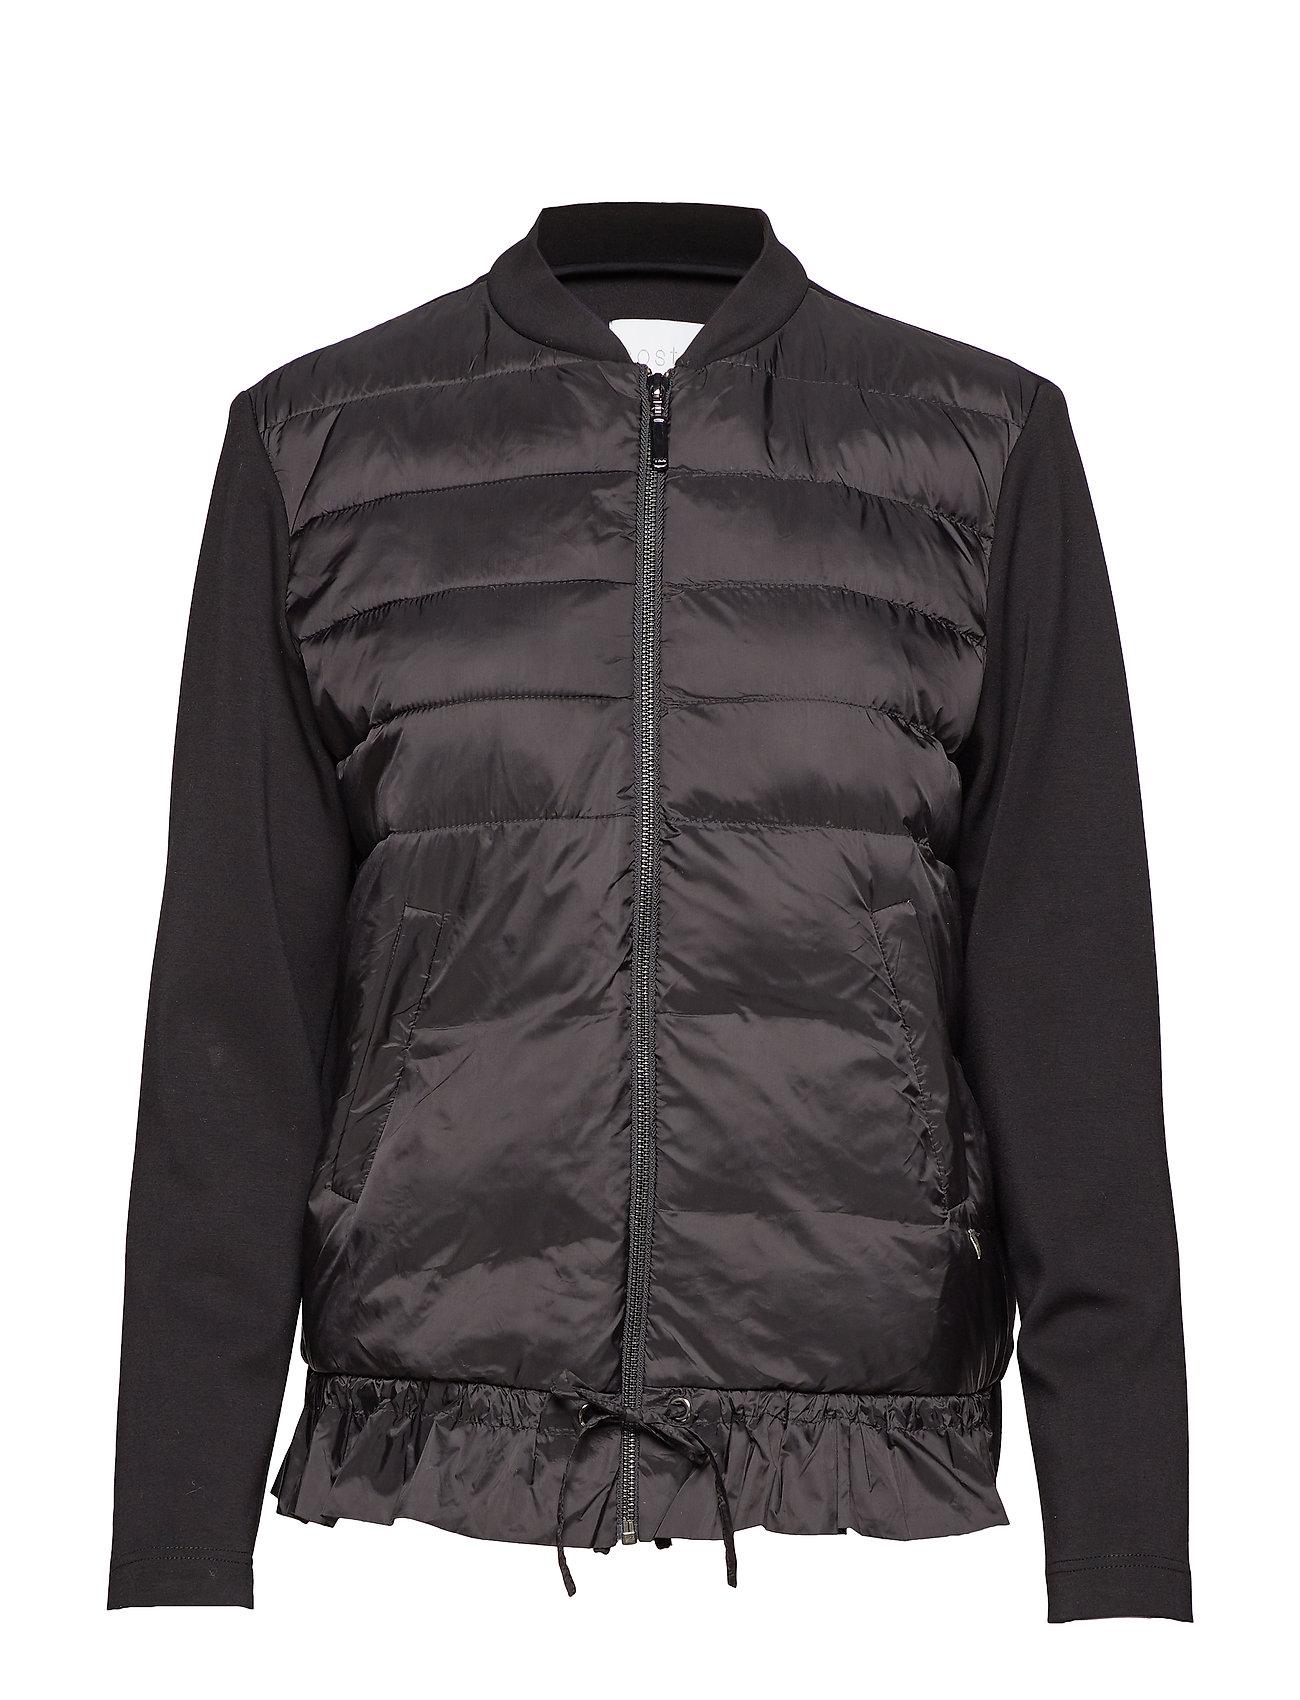 Jacket In Scuba W. Quiltet Down Fro - Coster Copenhagen